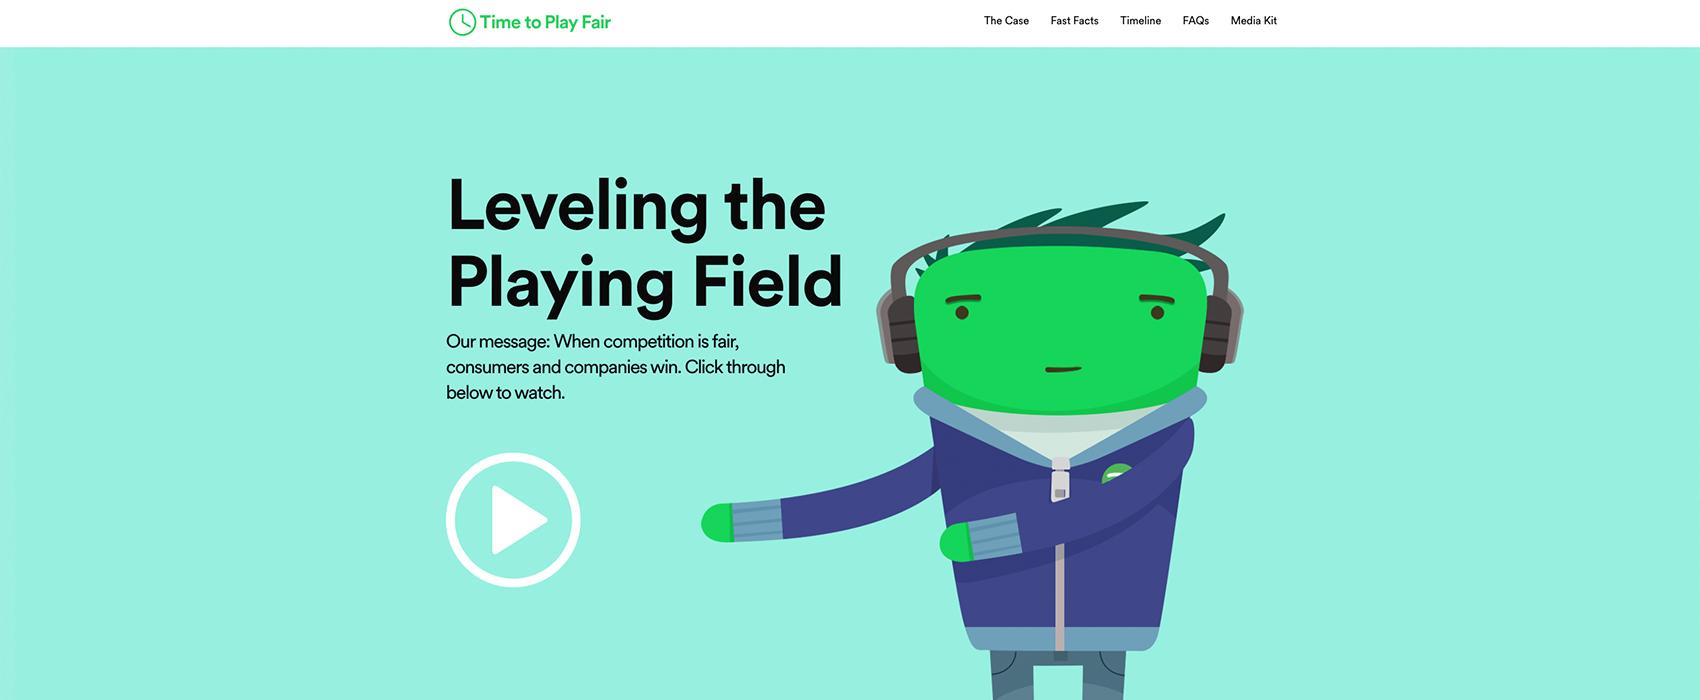 timetoplayfair-spotify-website